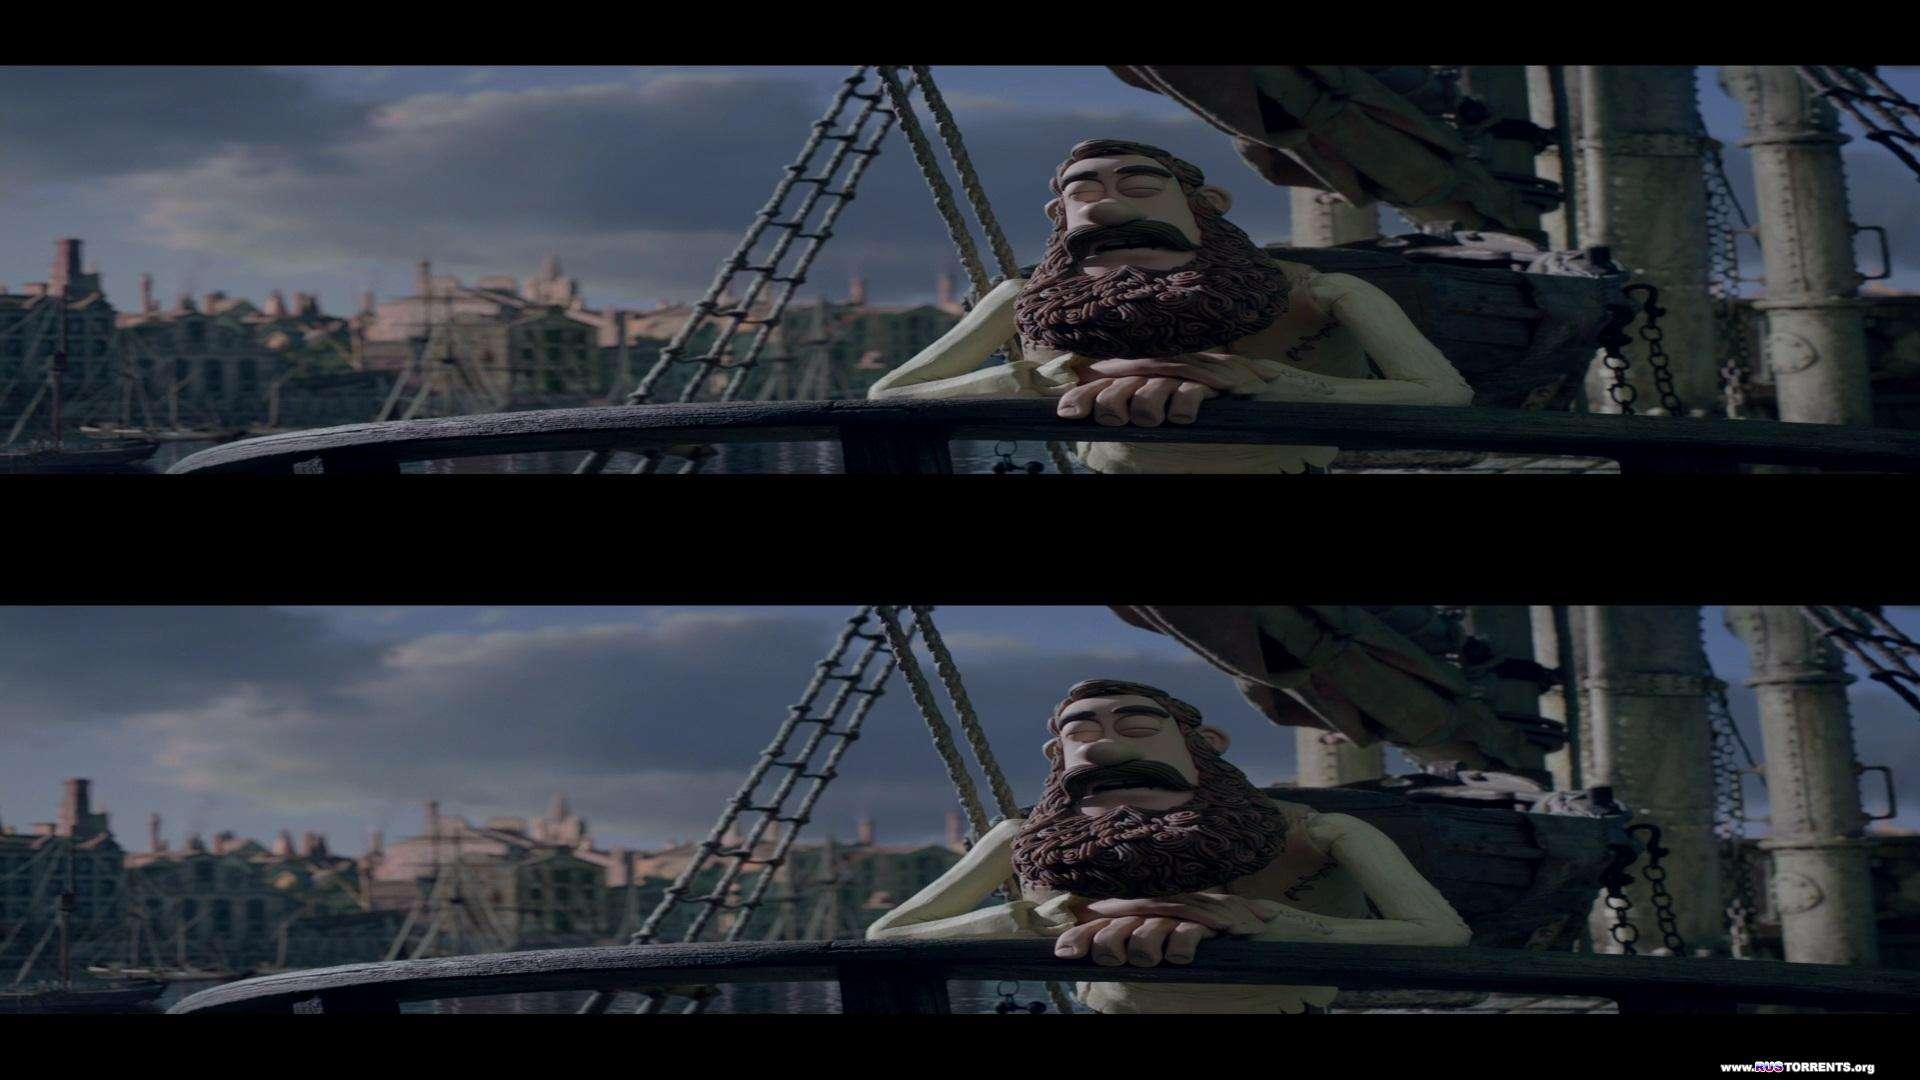 Пираты! Банда неудачников | BDRip 1080p | 3D-Video